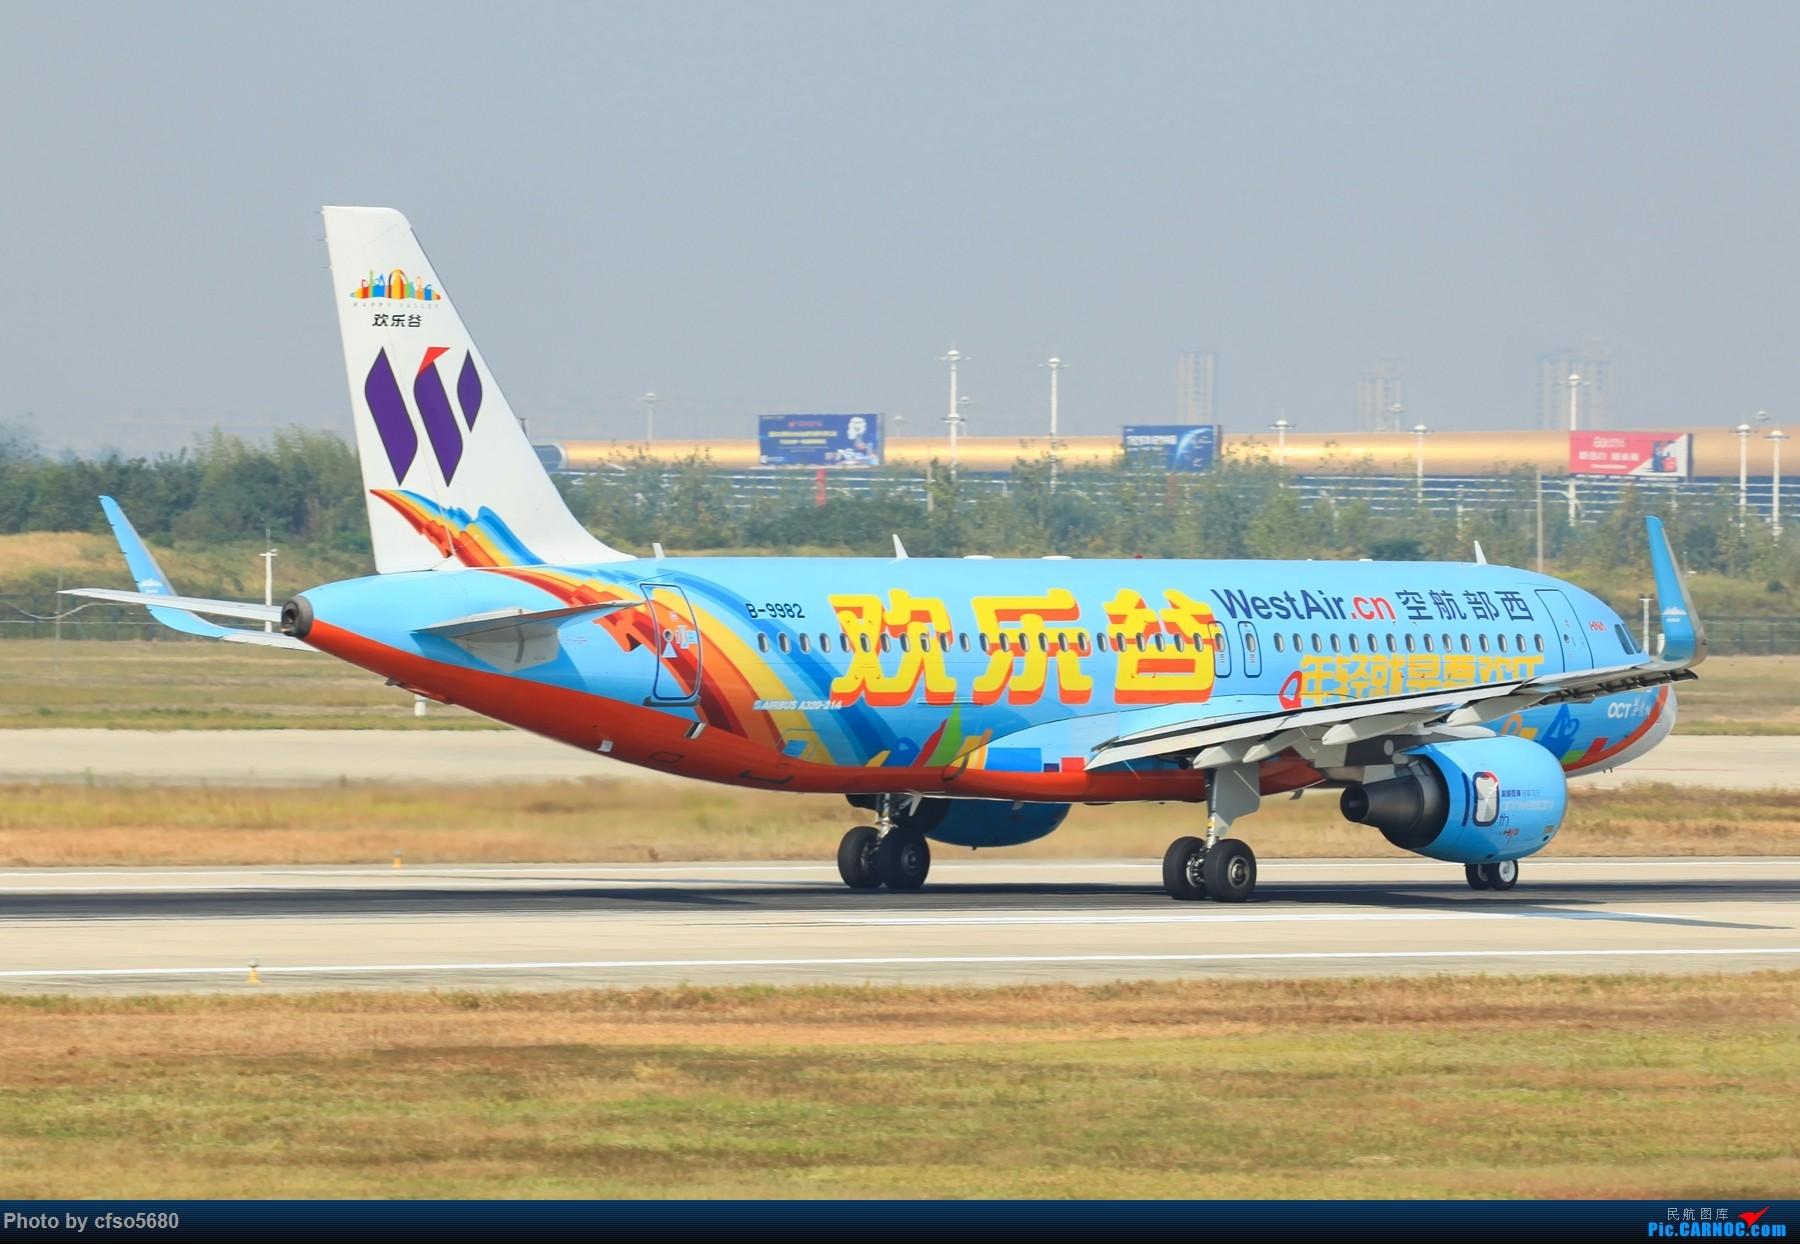 Re:[原创]国庆假期合肥新桥机场拍机活动 AIRBUS A320-200 B-9982 中国合肥新桥国际机场